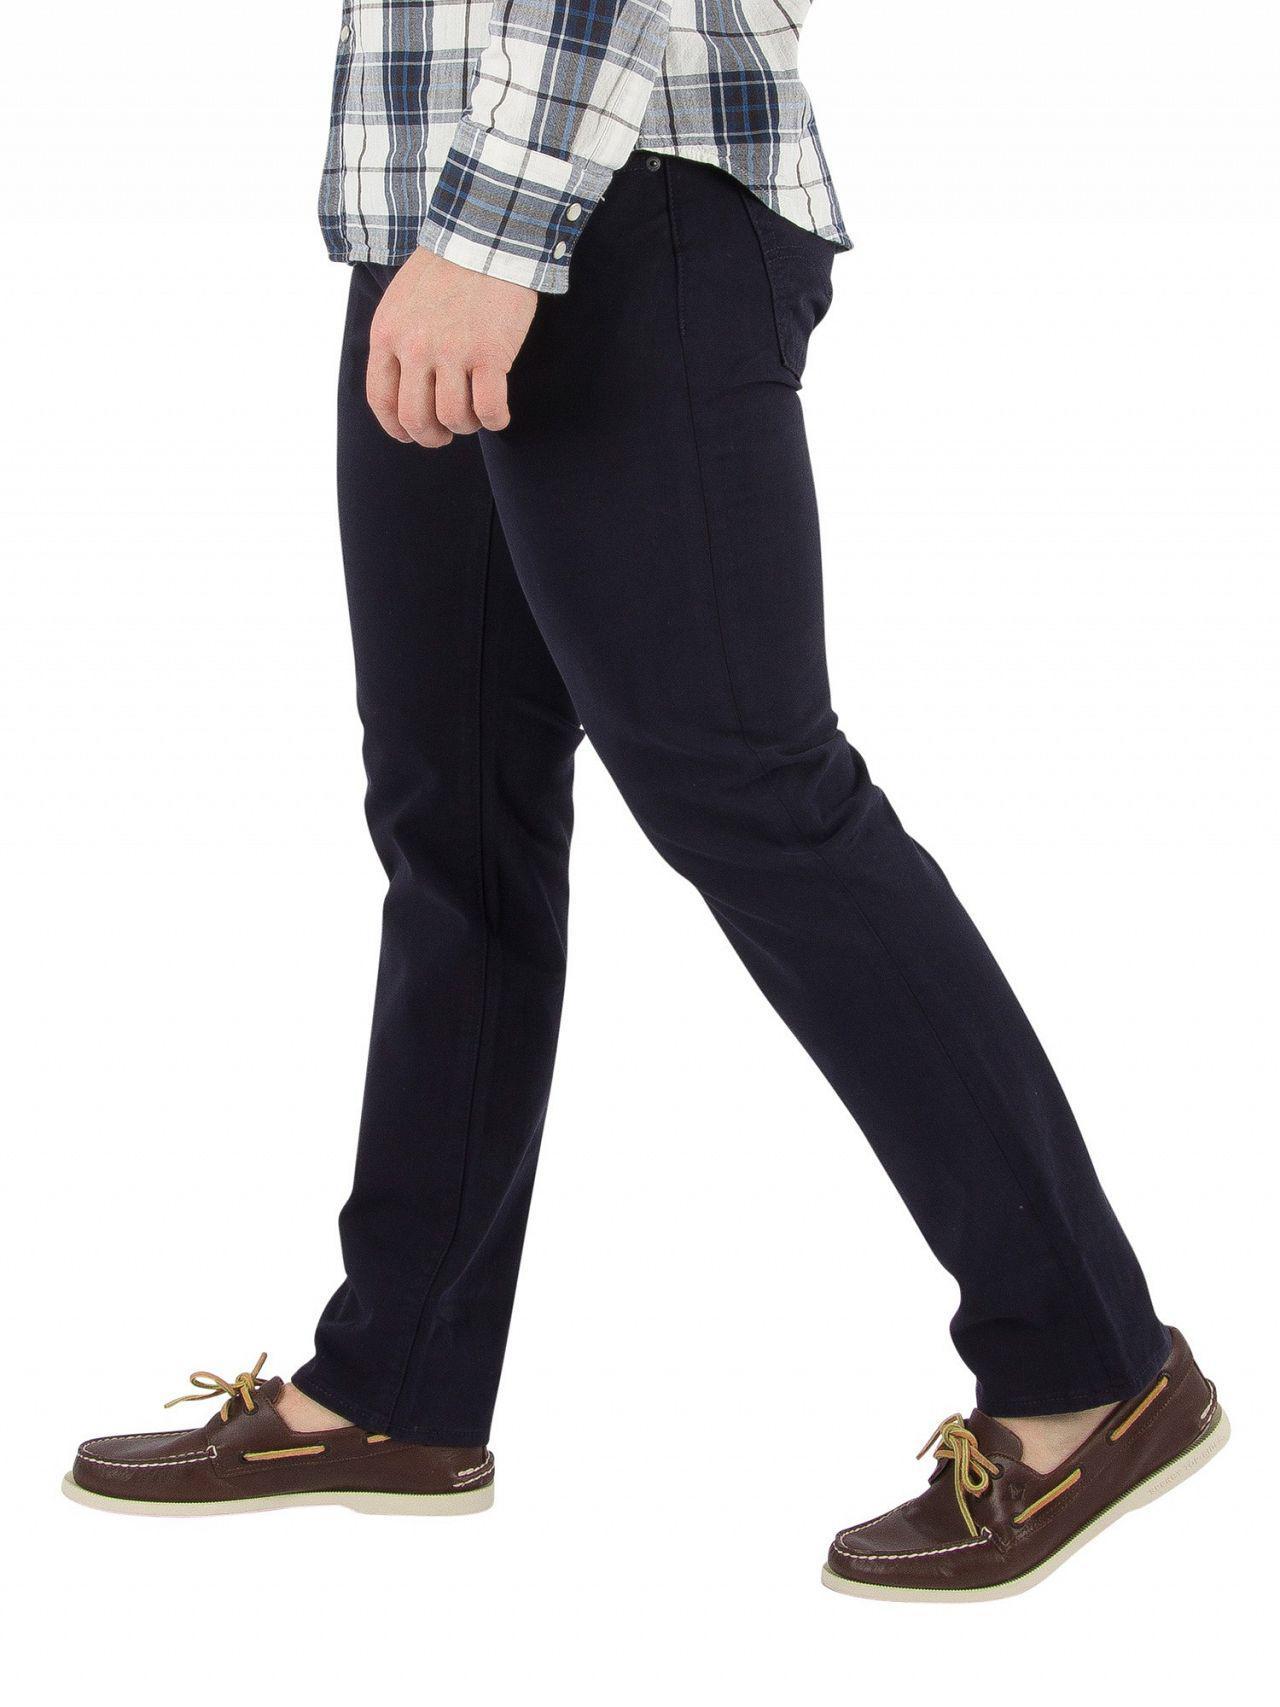 4de6d4cfef8 Levi s Nightwatch Blue 511 Slim Fit Jeans in Blue for Men - Lyst